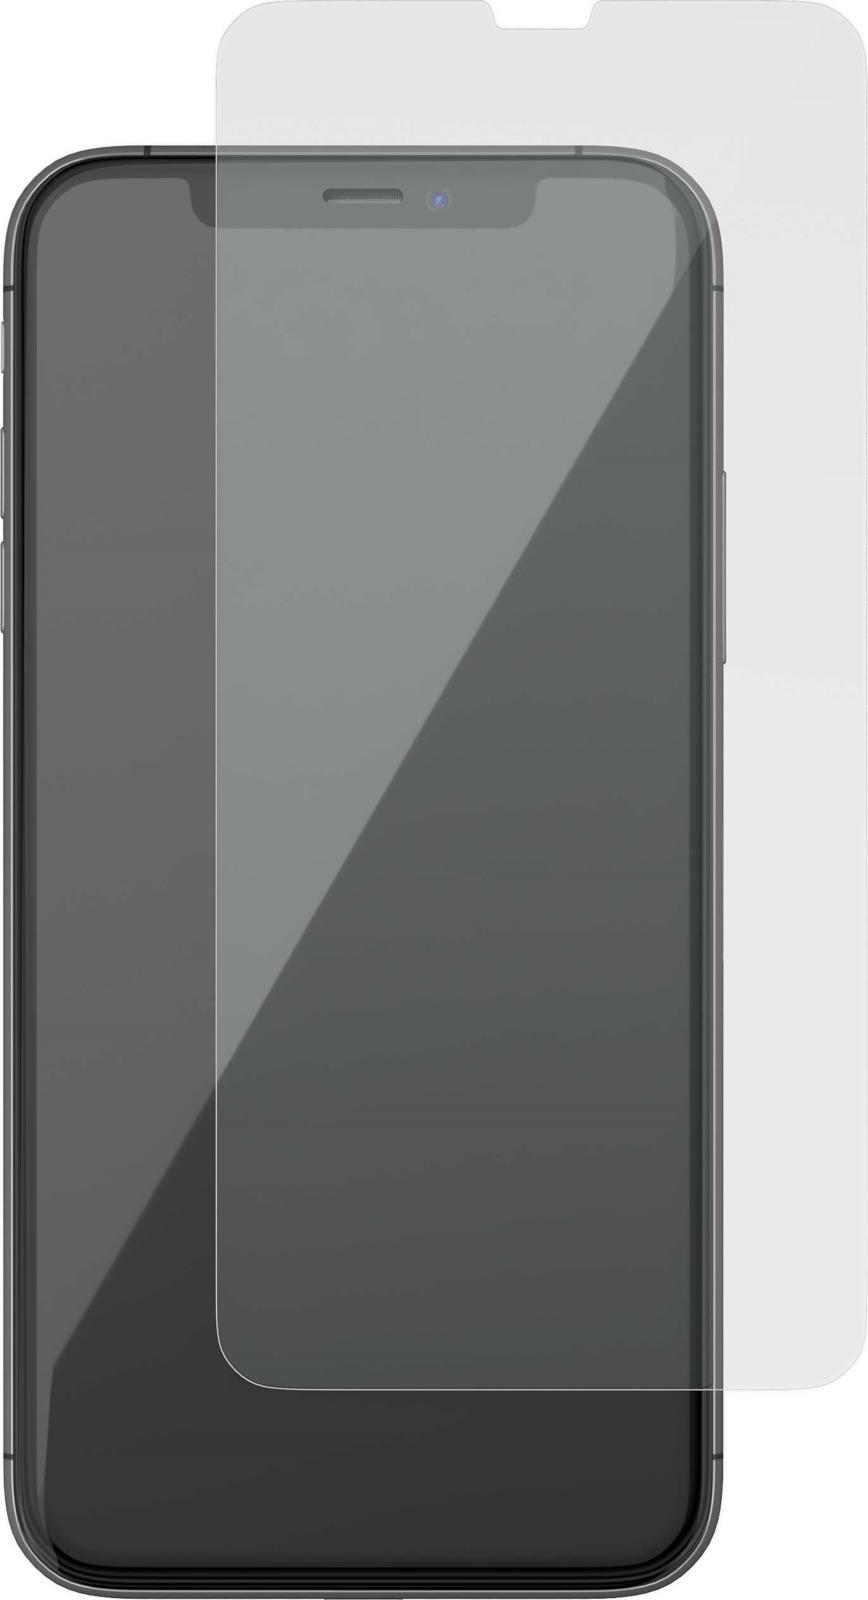 Защитное стекло uBear Premium Glass Screen Protector 0,2 мм для Apple iPhone Xr, прозрачный